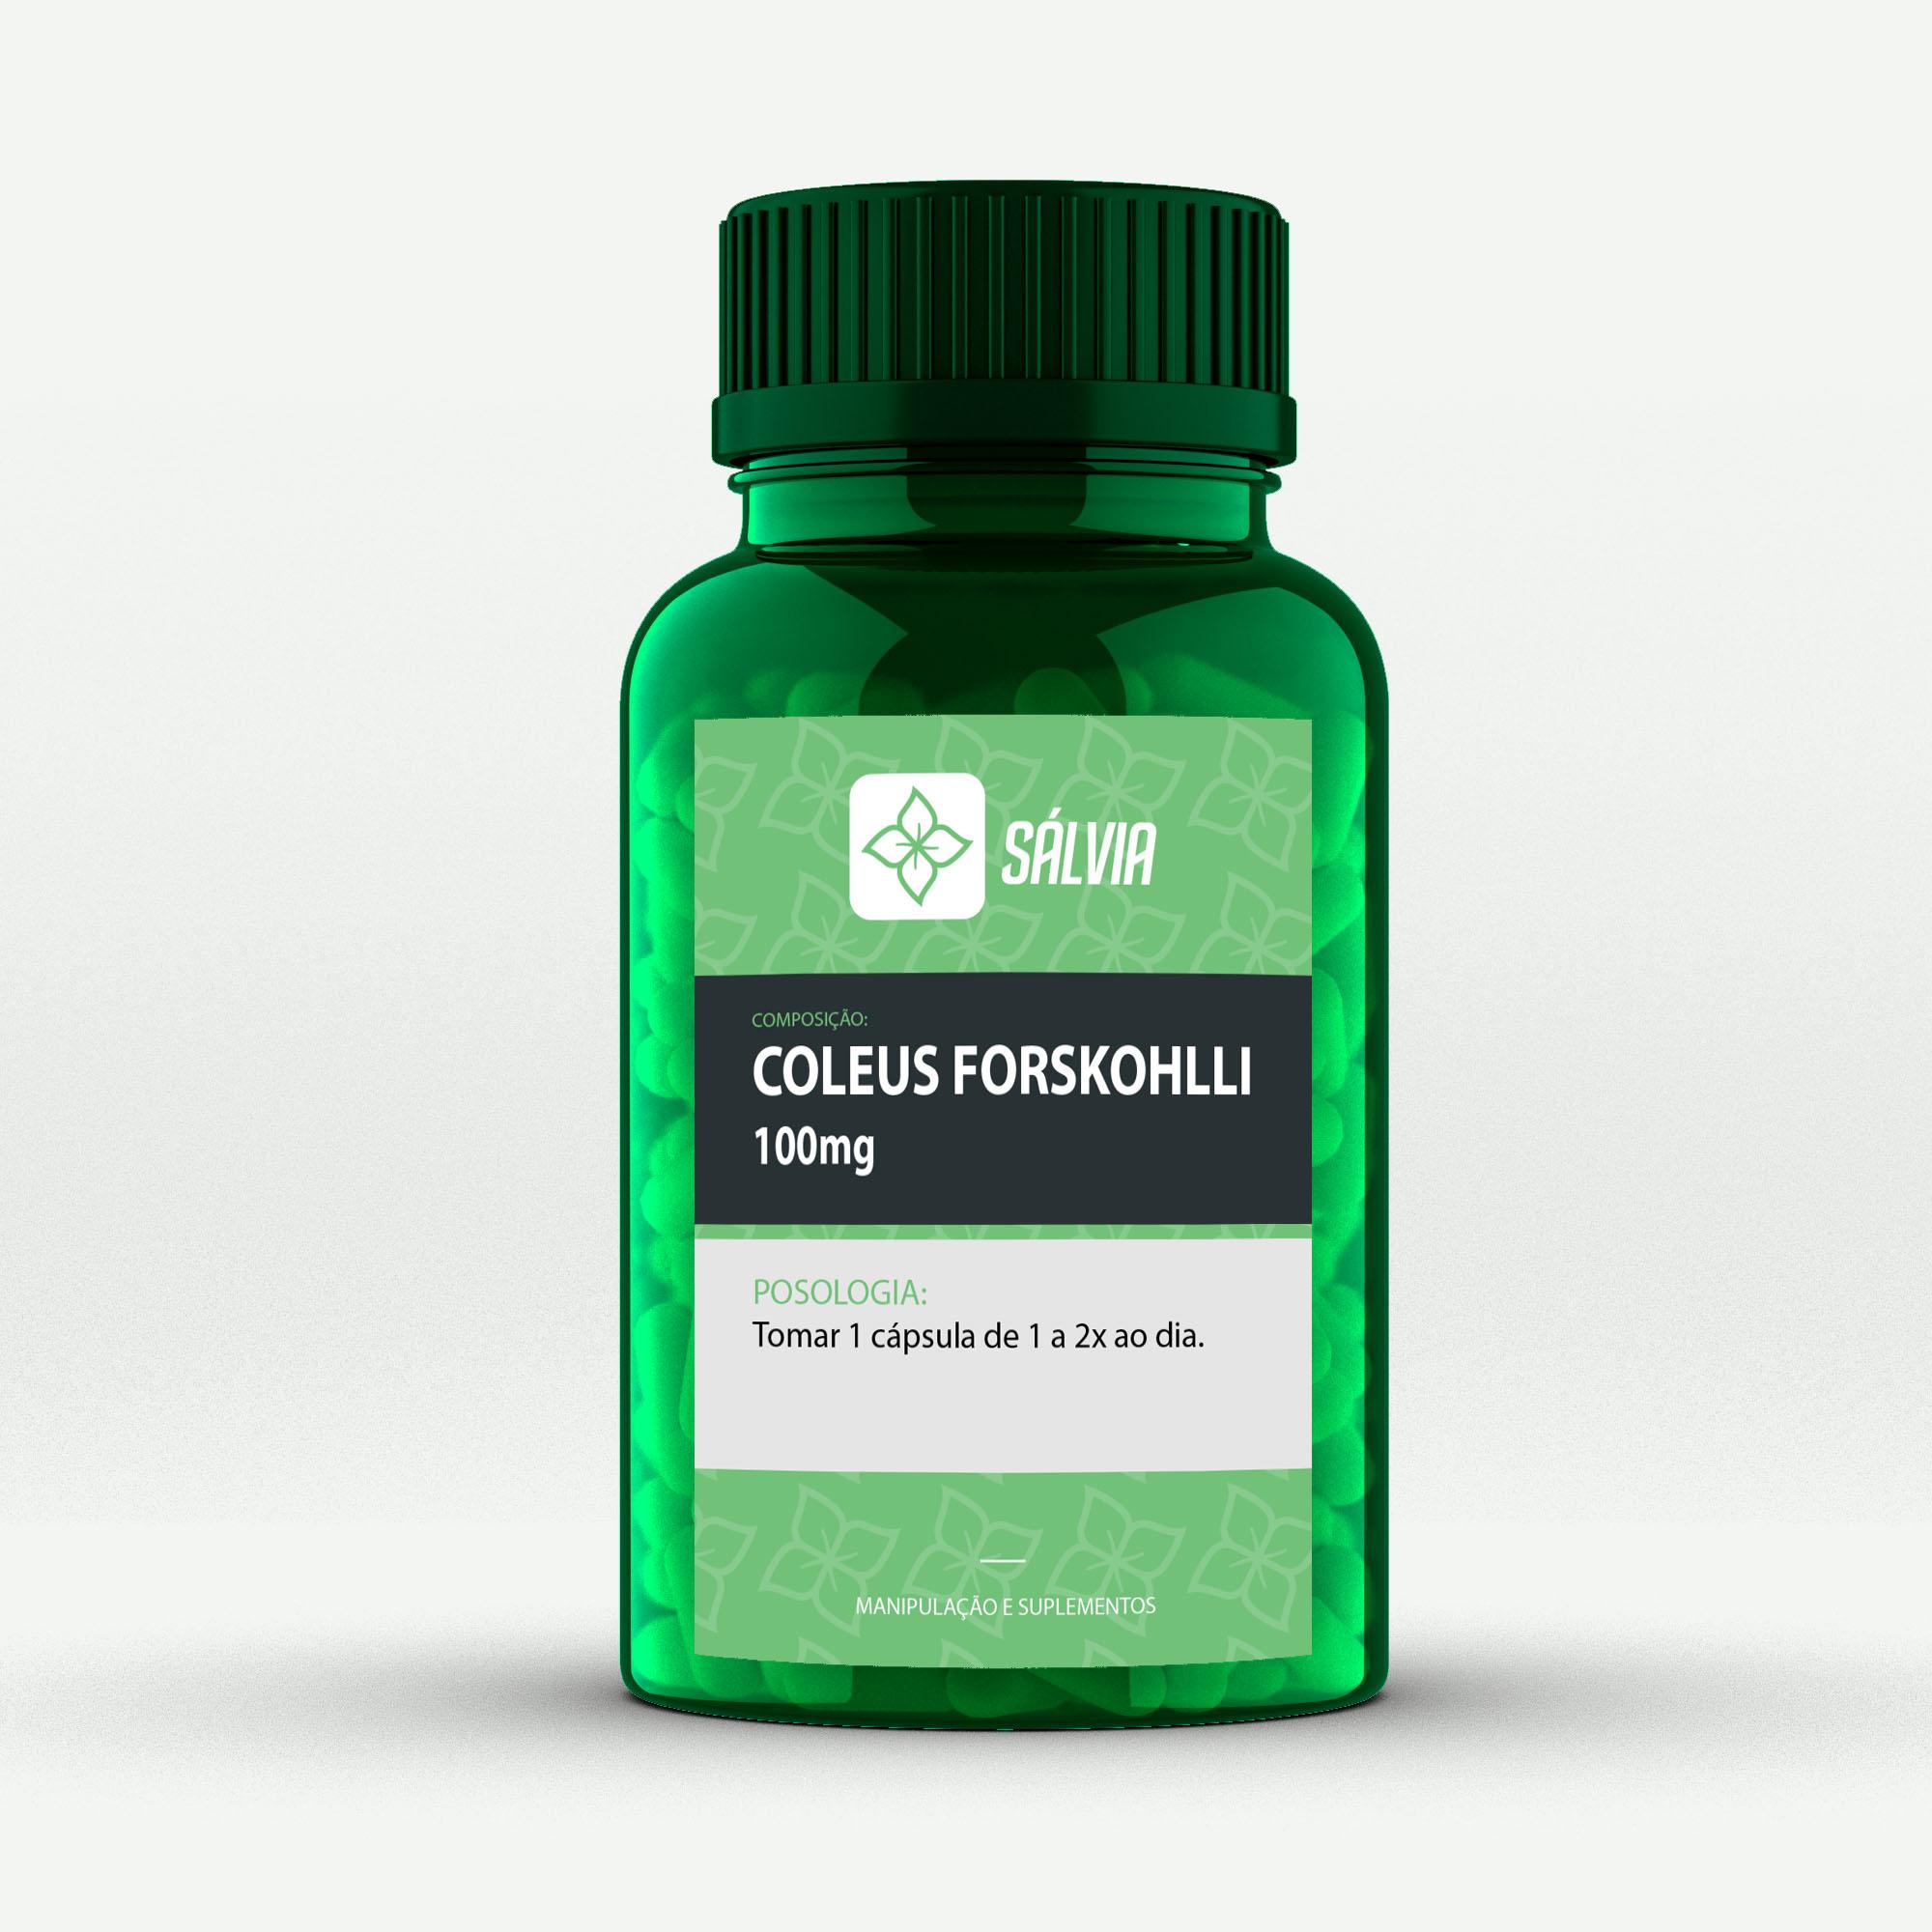 COLEUS FORSKOHLLI 100mg – Cápsulas